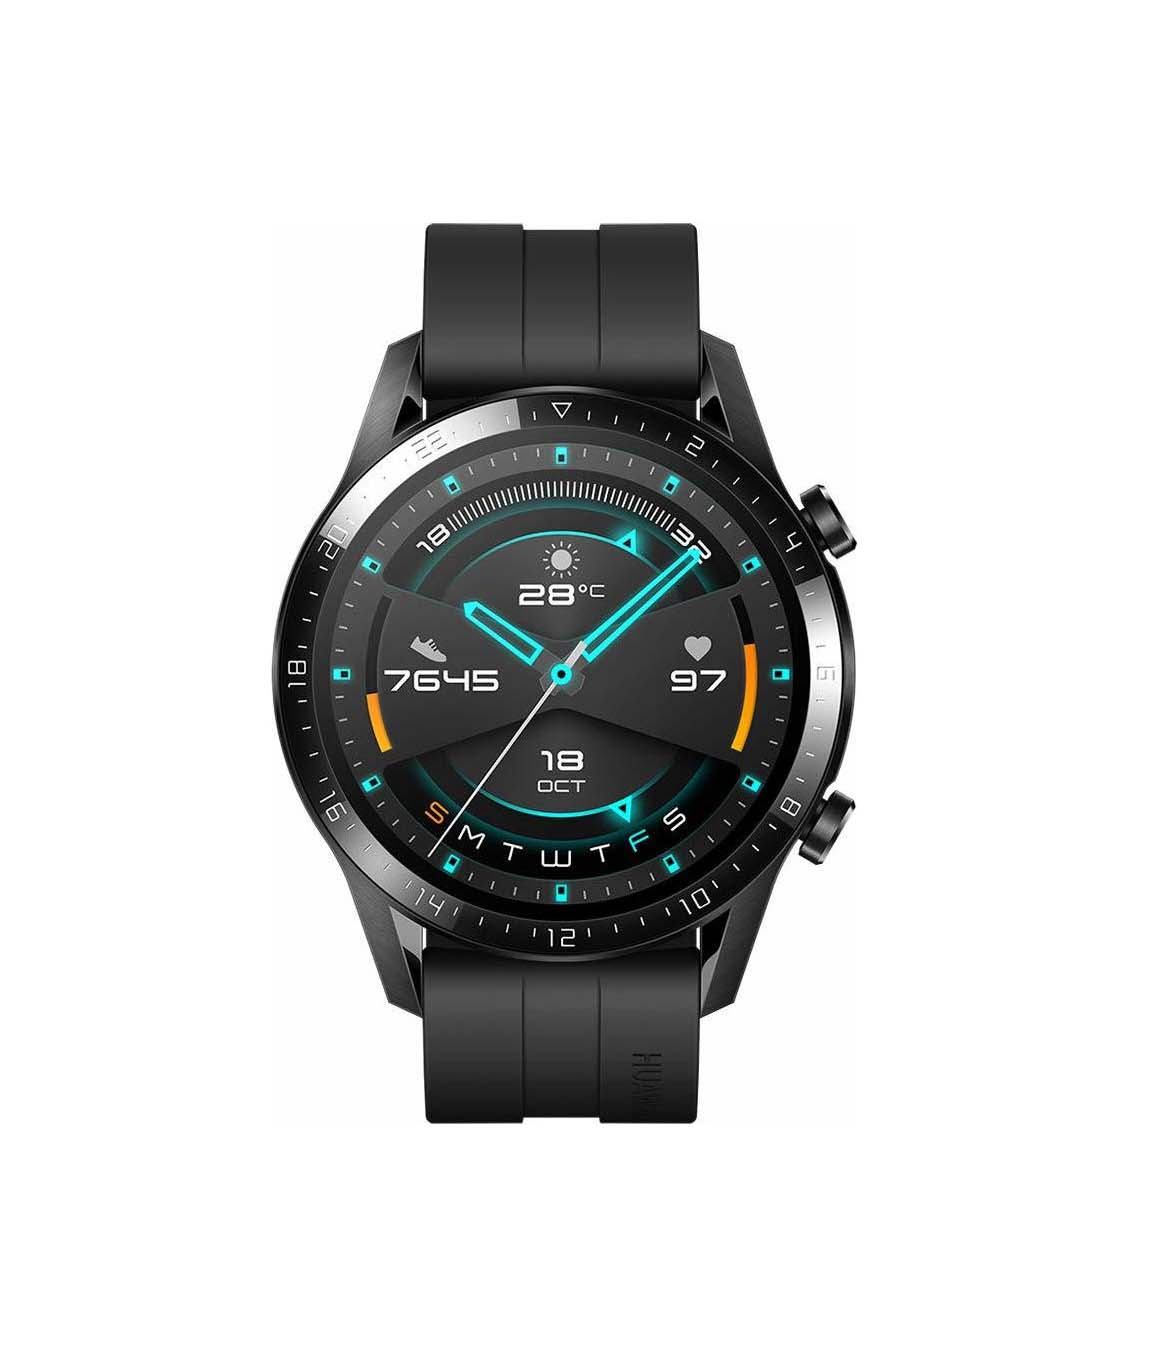 Huawei Watch GT 2 Sport 46mm Matte Black 4061856507613 Πληρωμή έως 24 δόσεις*